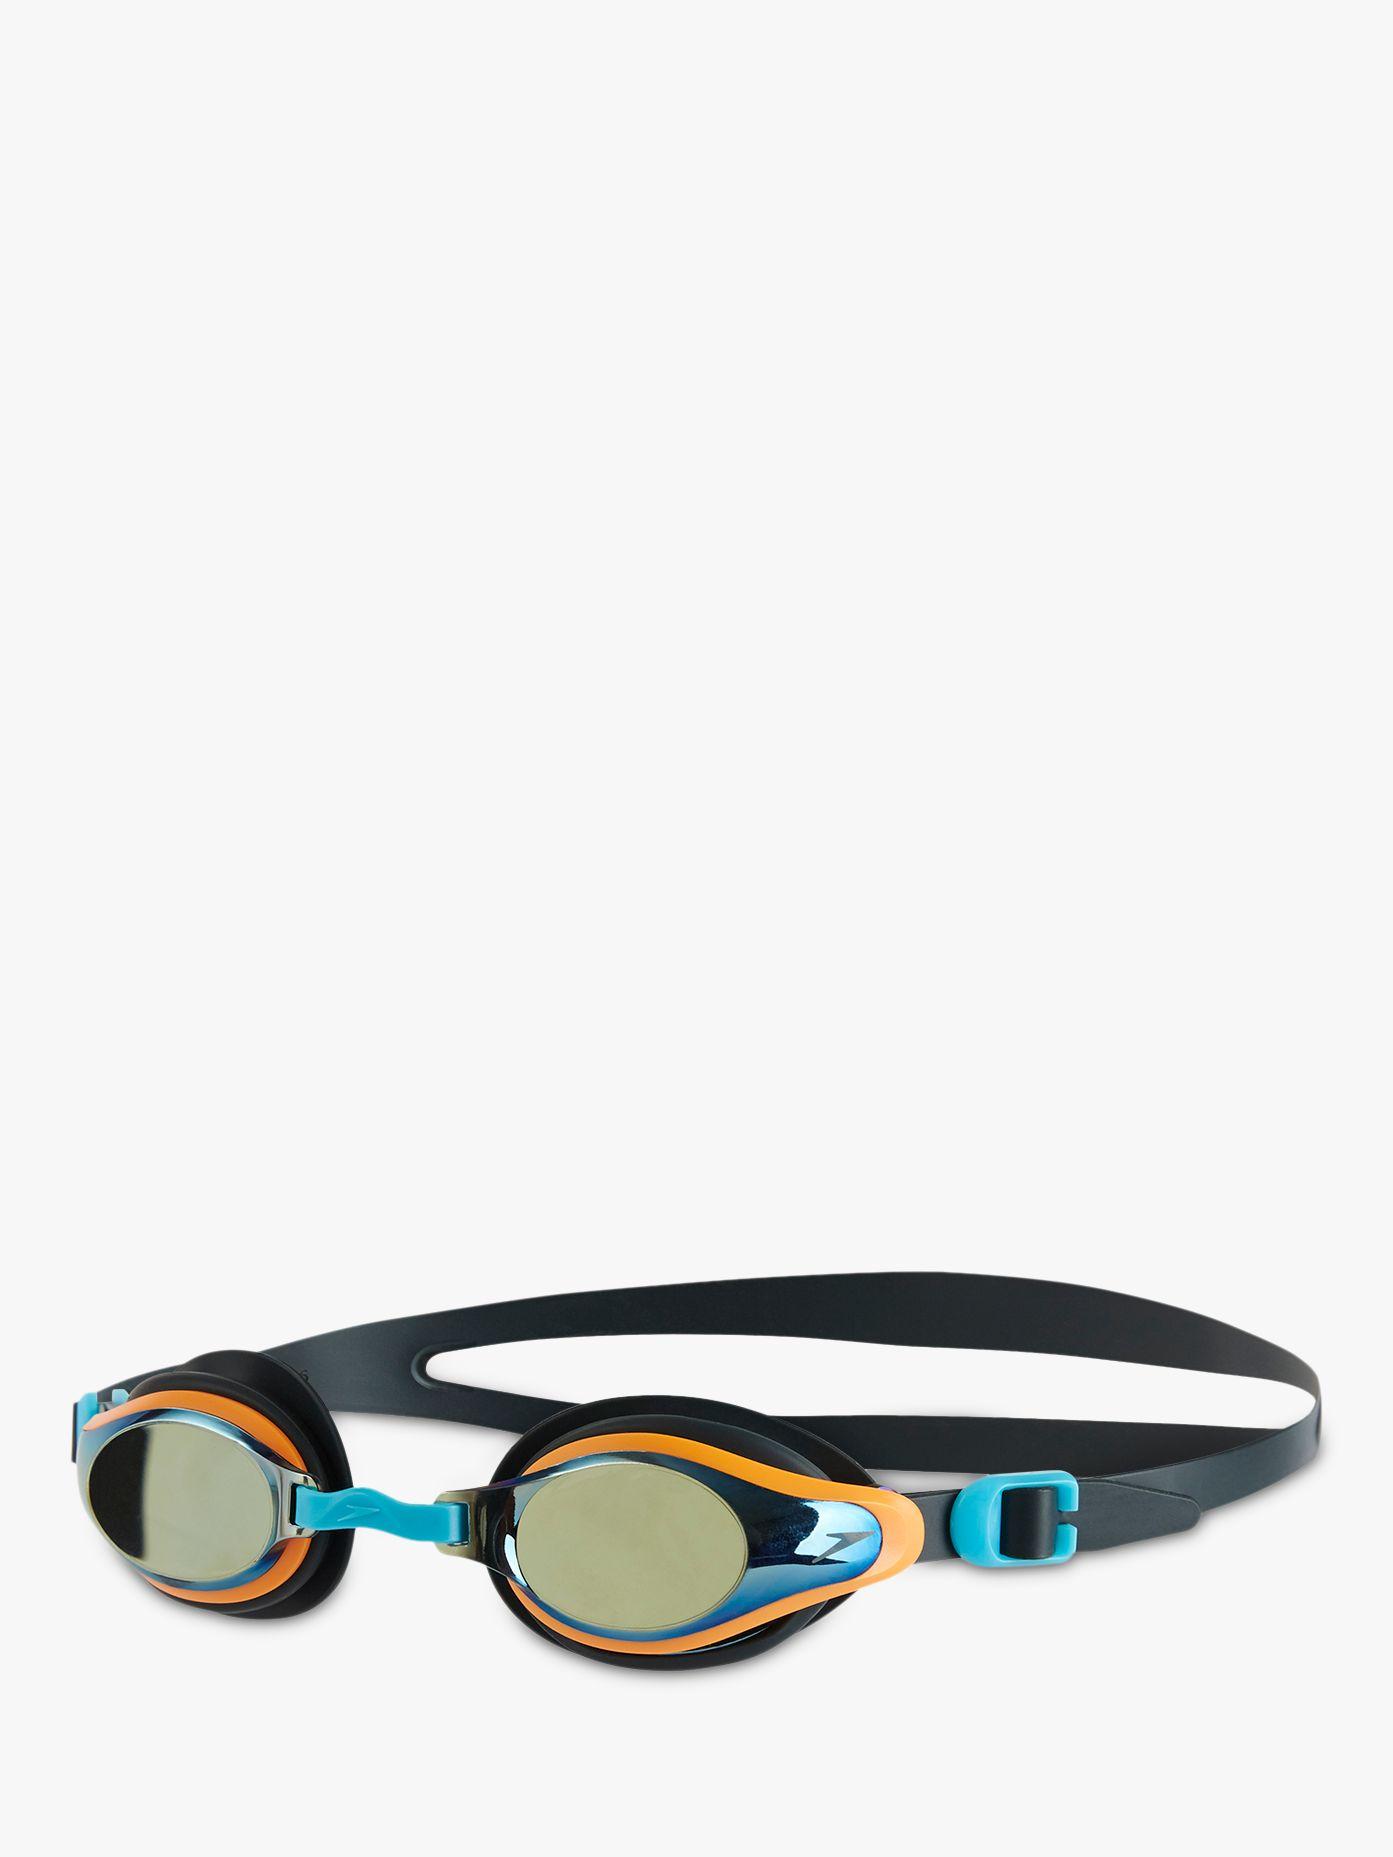 Speedo Speedo Mariner Supreme Mirror Children's Swimming Goggles, Grey/Java/Titanium